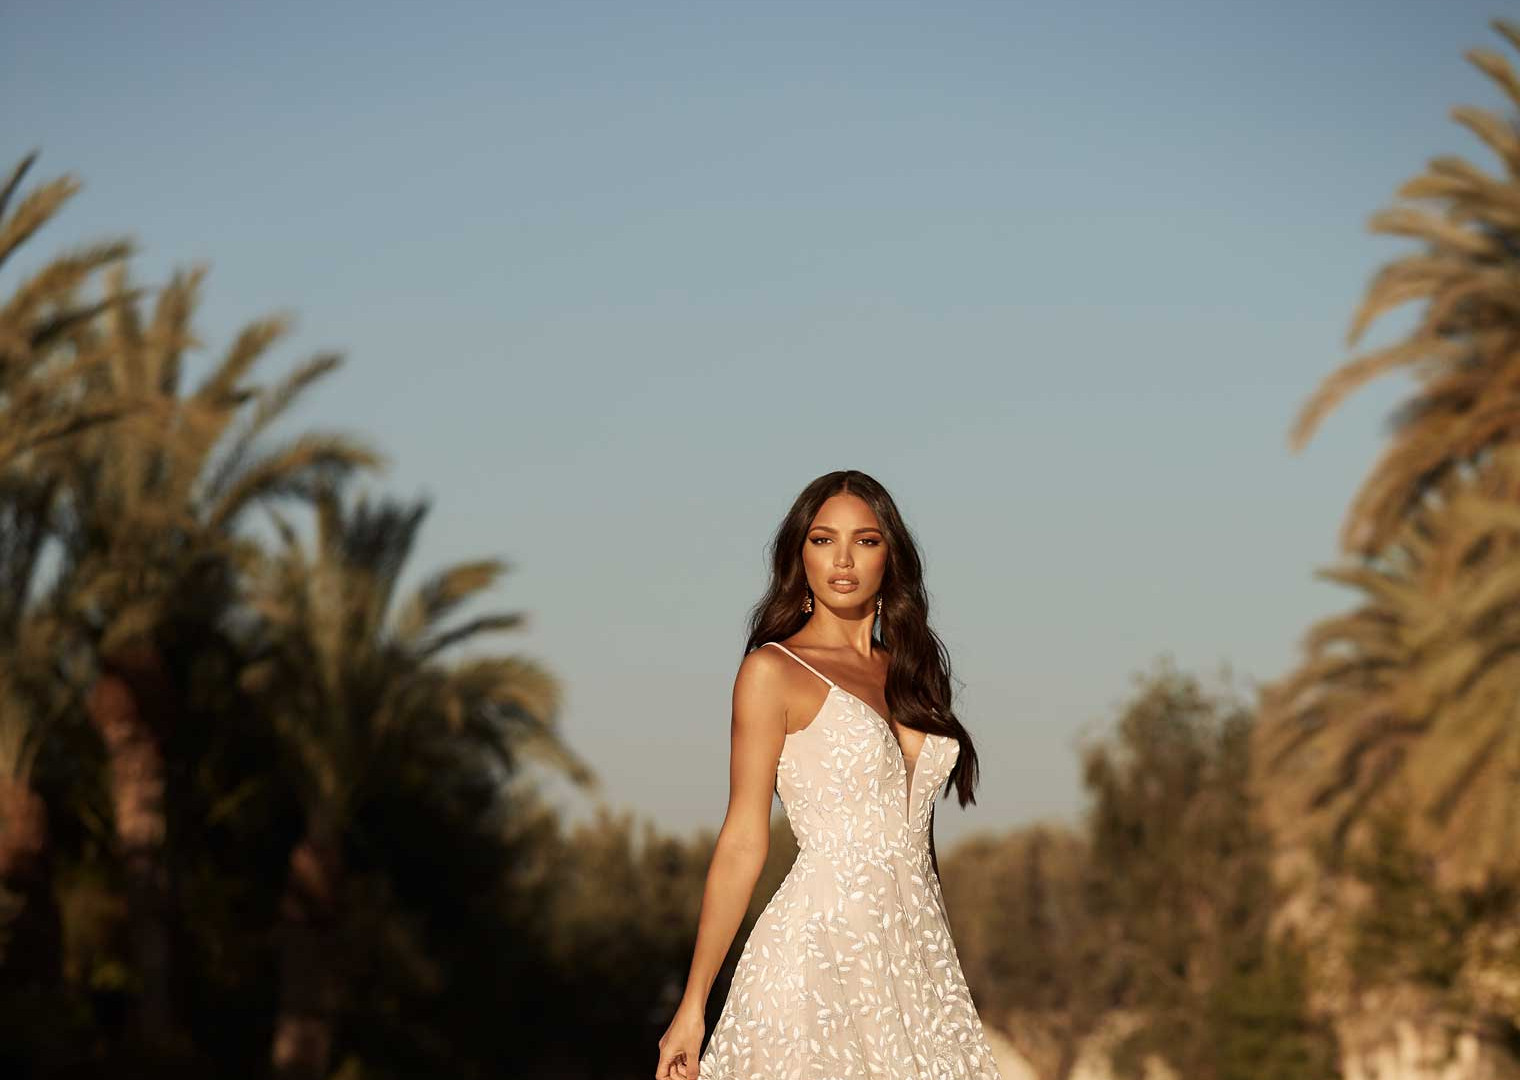 Adrian-MadiLane- Pretty-white-dress fron